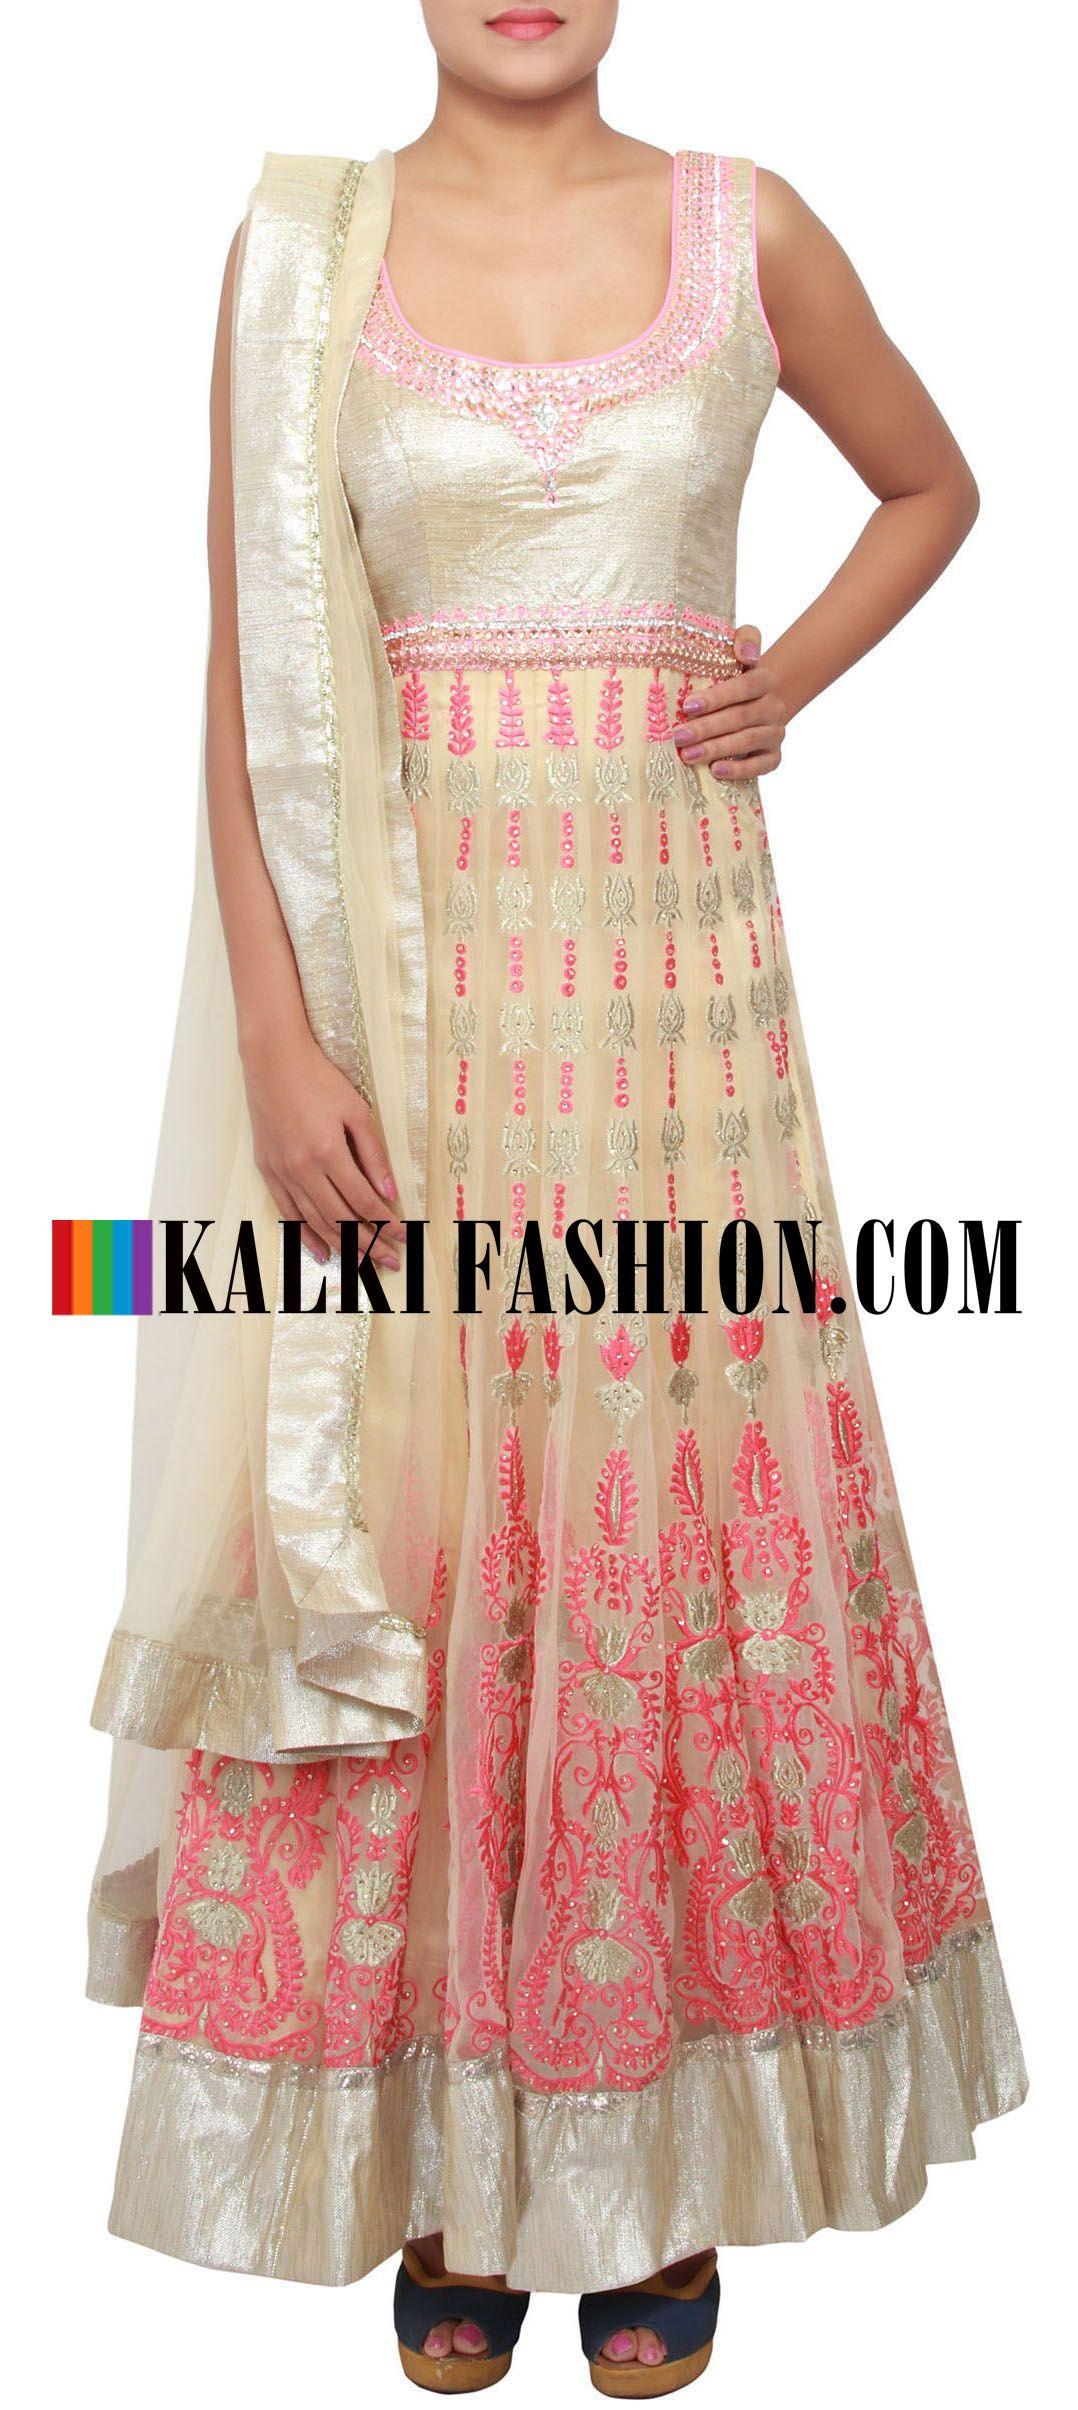 Get this beautiful salwar kameez here: http://www.kalkifashion.com/beige-anarkali-suit-embellished-in-resham-and-zari-only-on-kalki.html Free shipping worldwide.